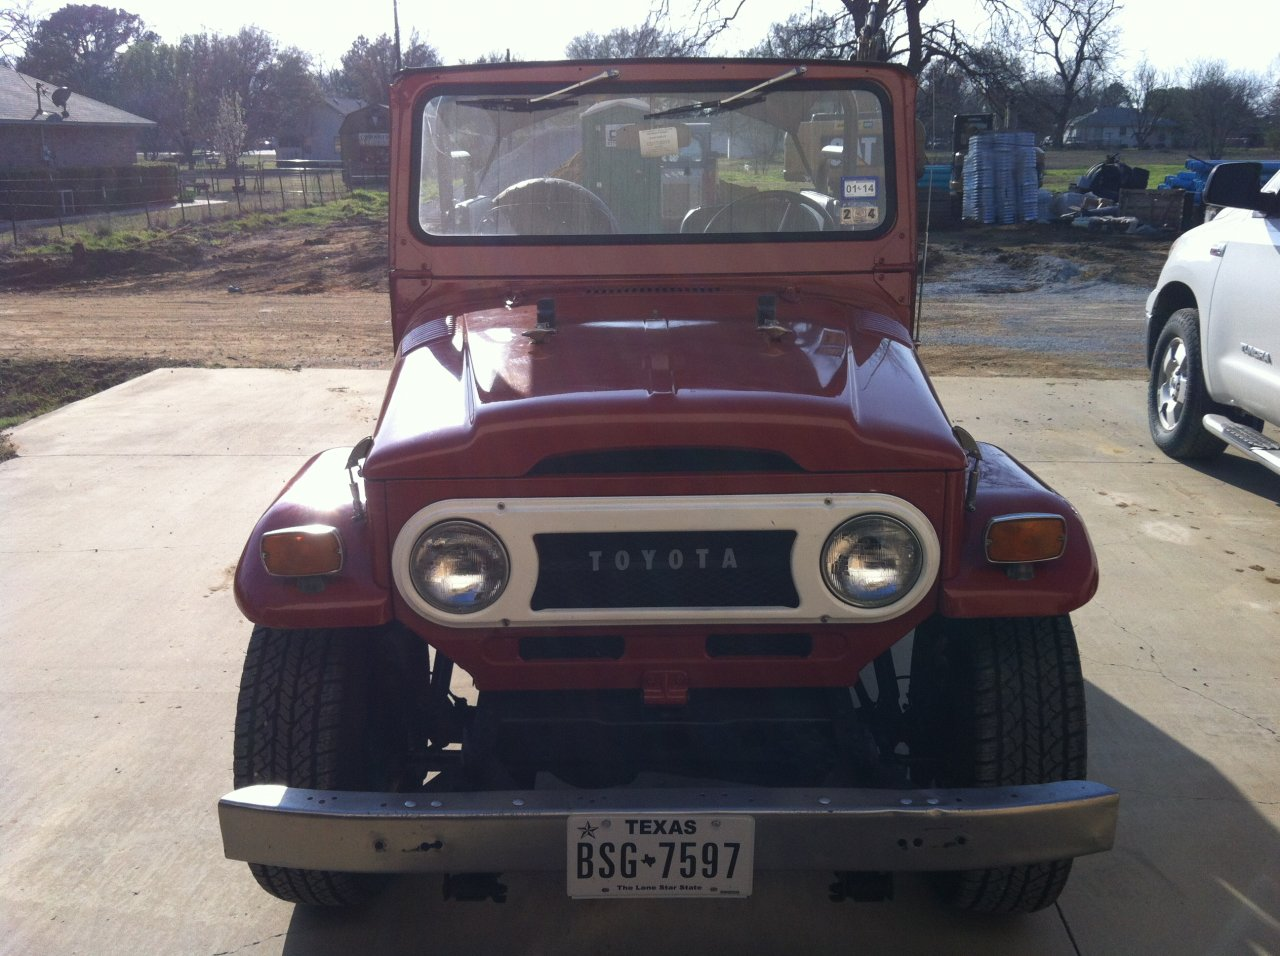 For Sale 1973 Toyota Fj40 Land Cruiser Ih8mud Forum Restored Three Years Ago 4wd All Original